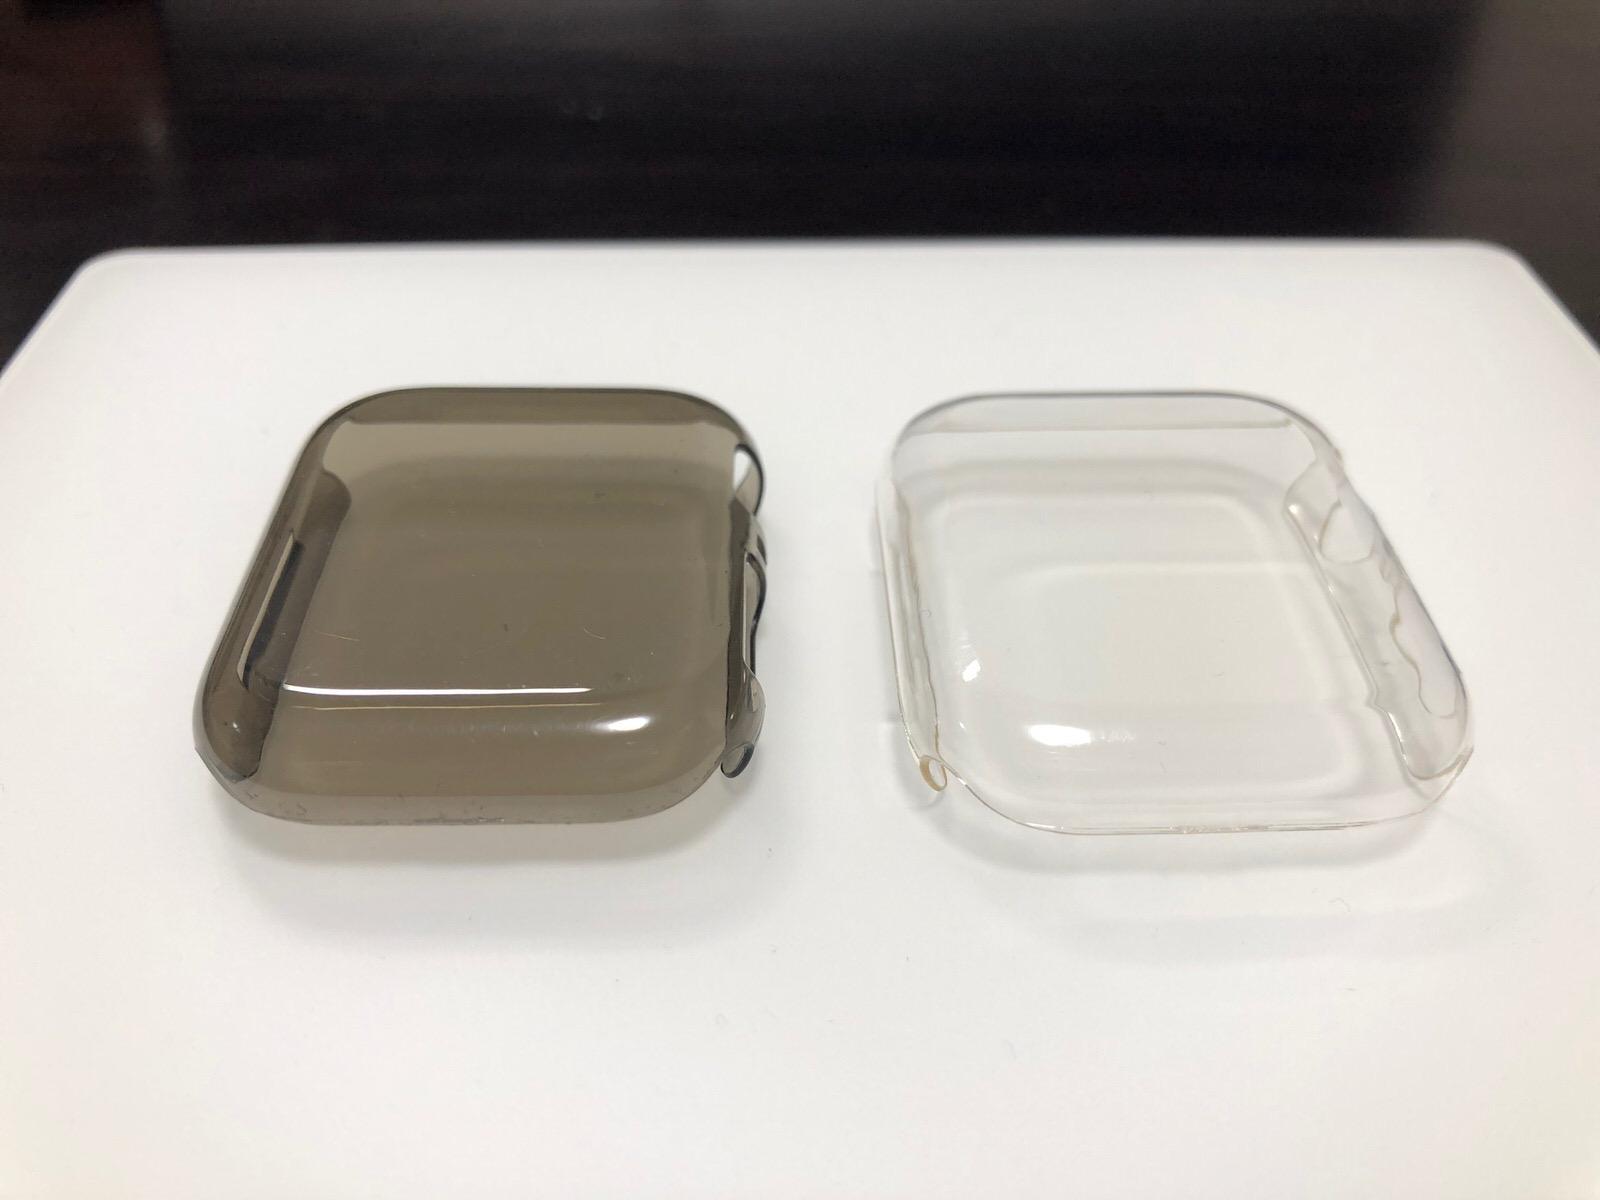 casualcatch Apple watch4 ケース 保護ケース カバー PCケース 傷を防止 防塵 耐衝撃性 44mm-3